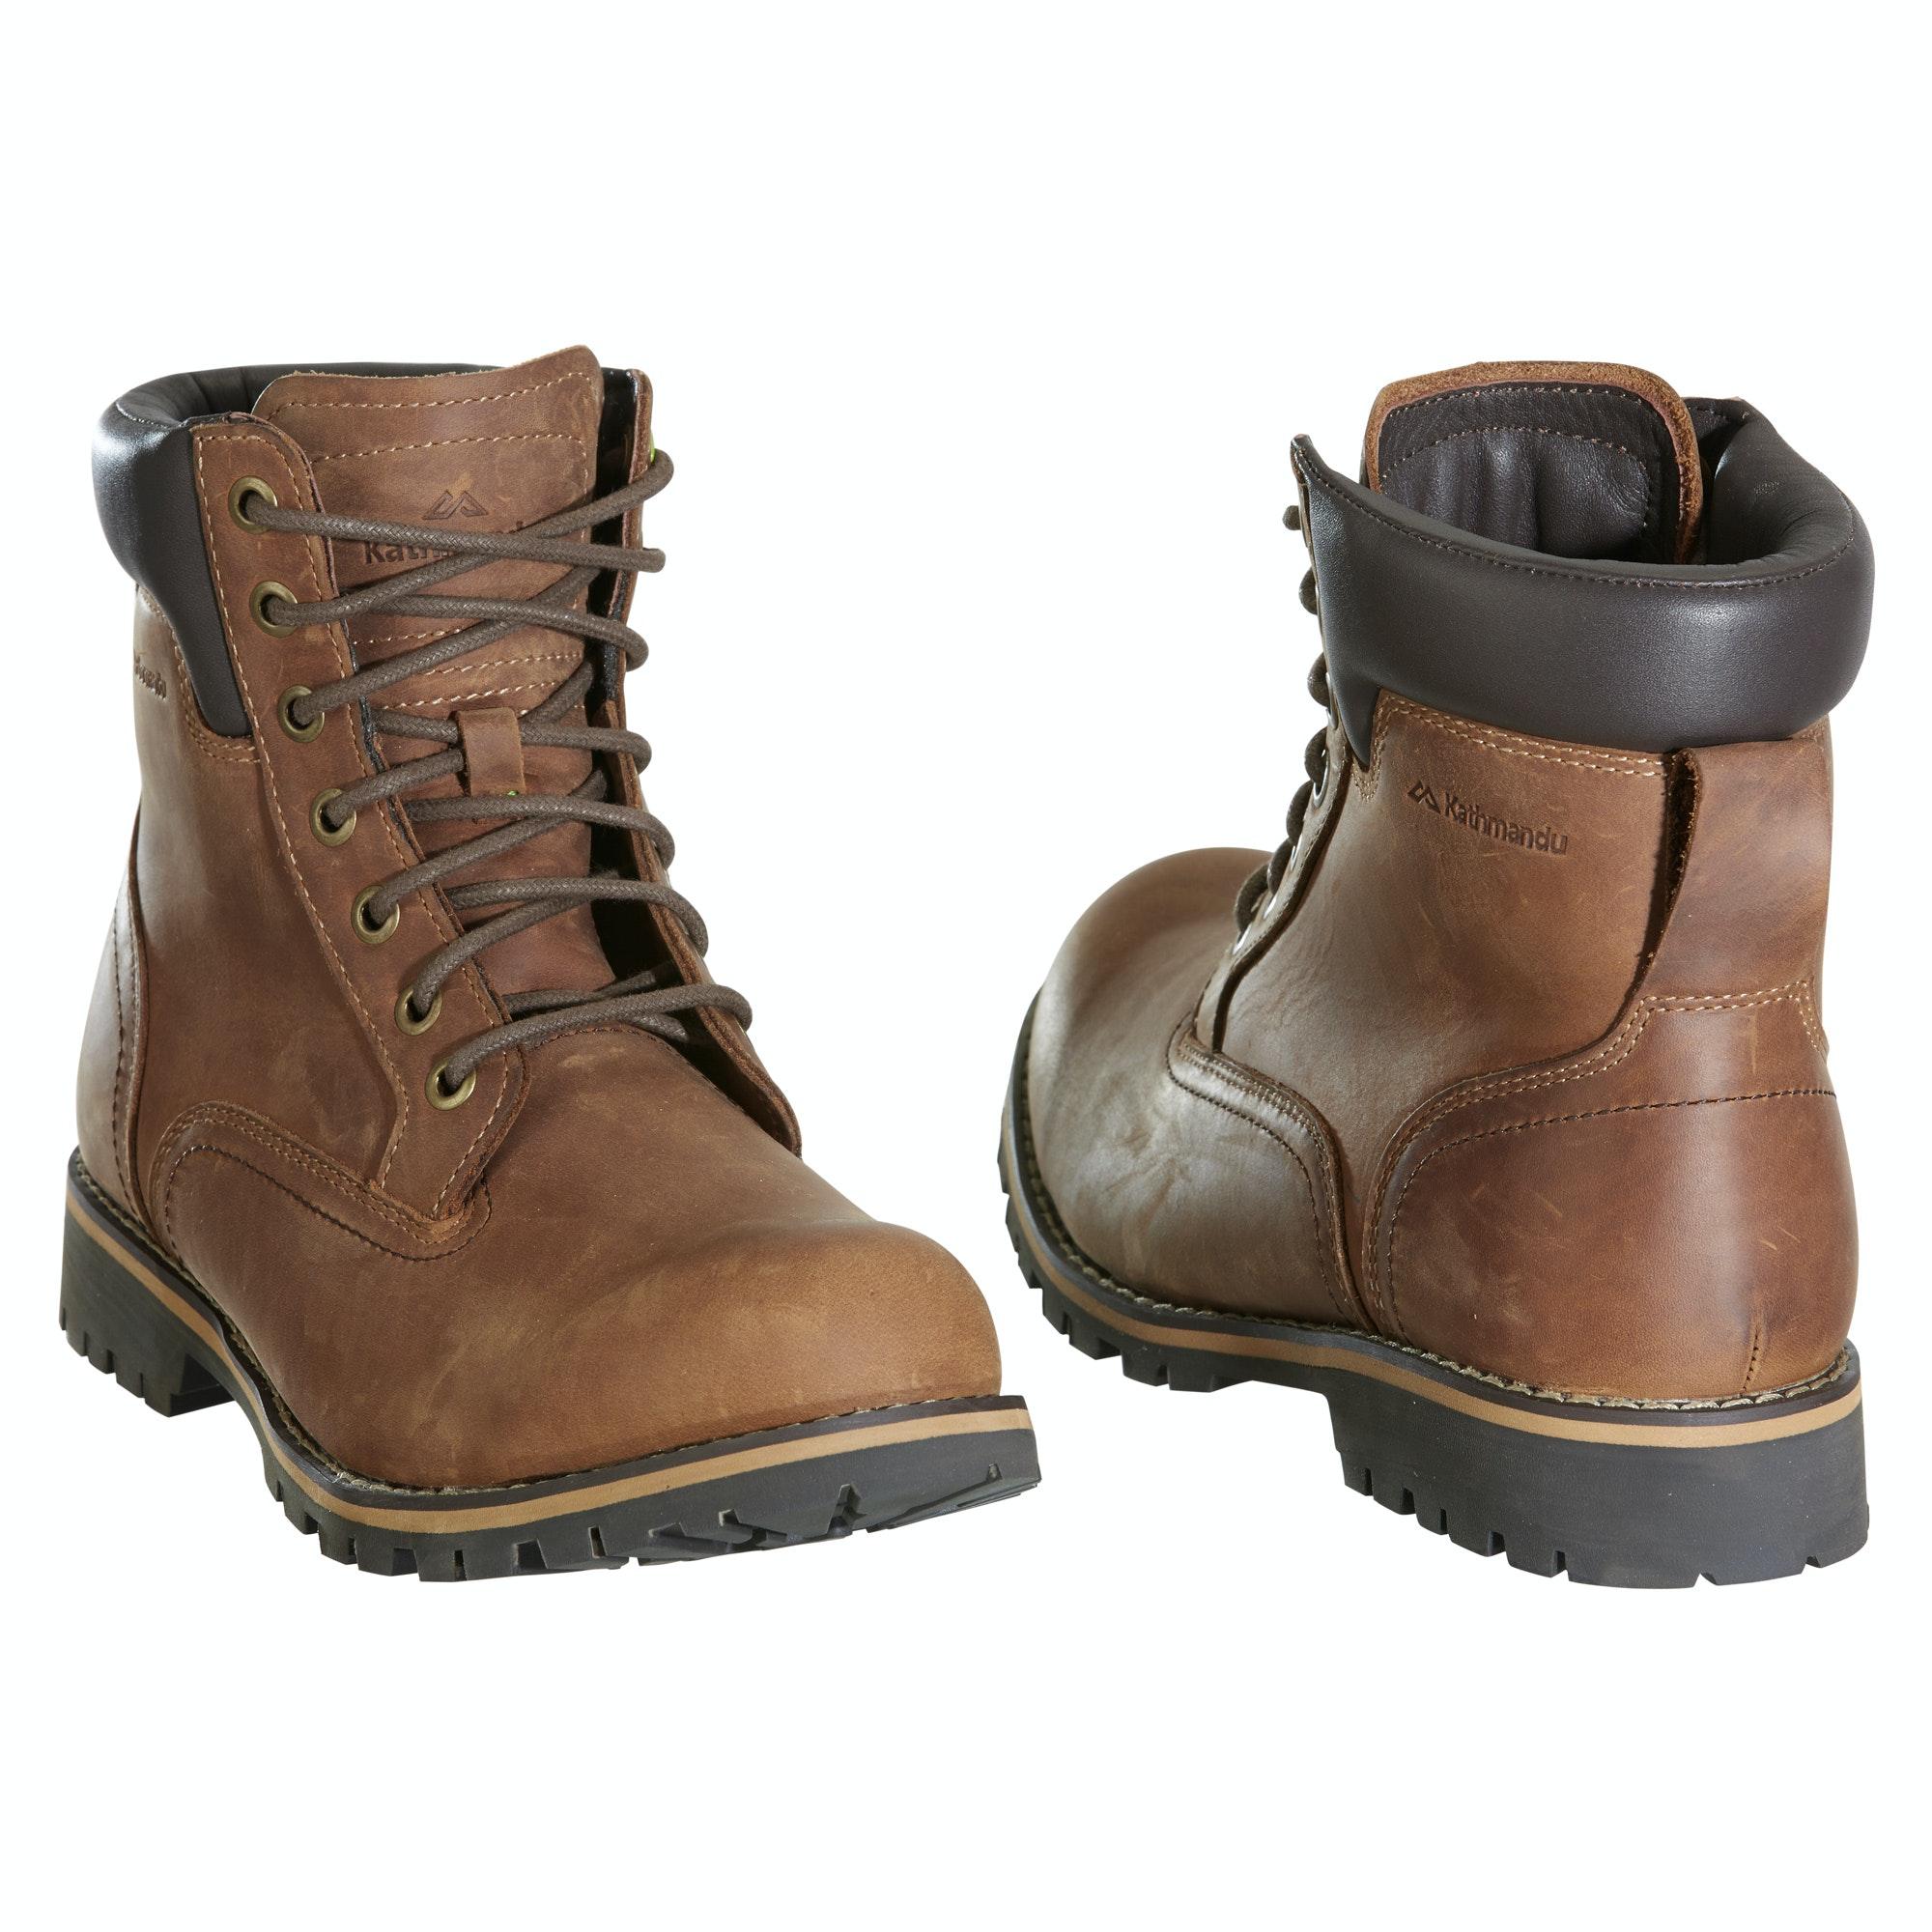 kathmandu seattle mens casual work boot style lace up